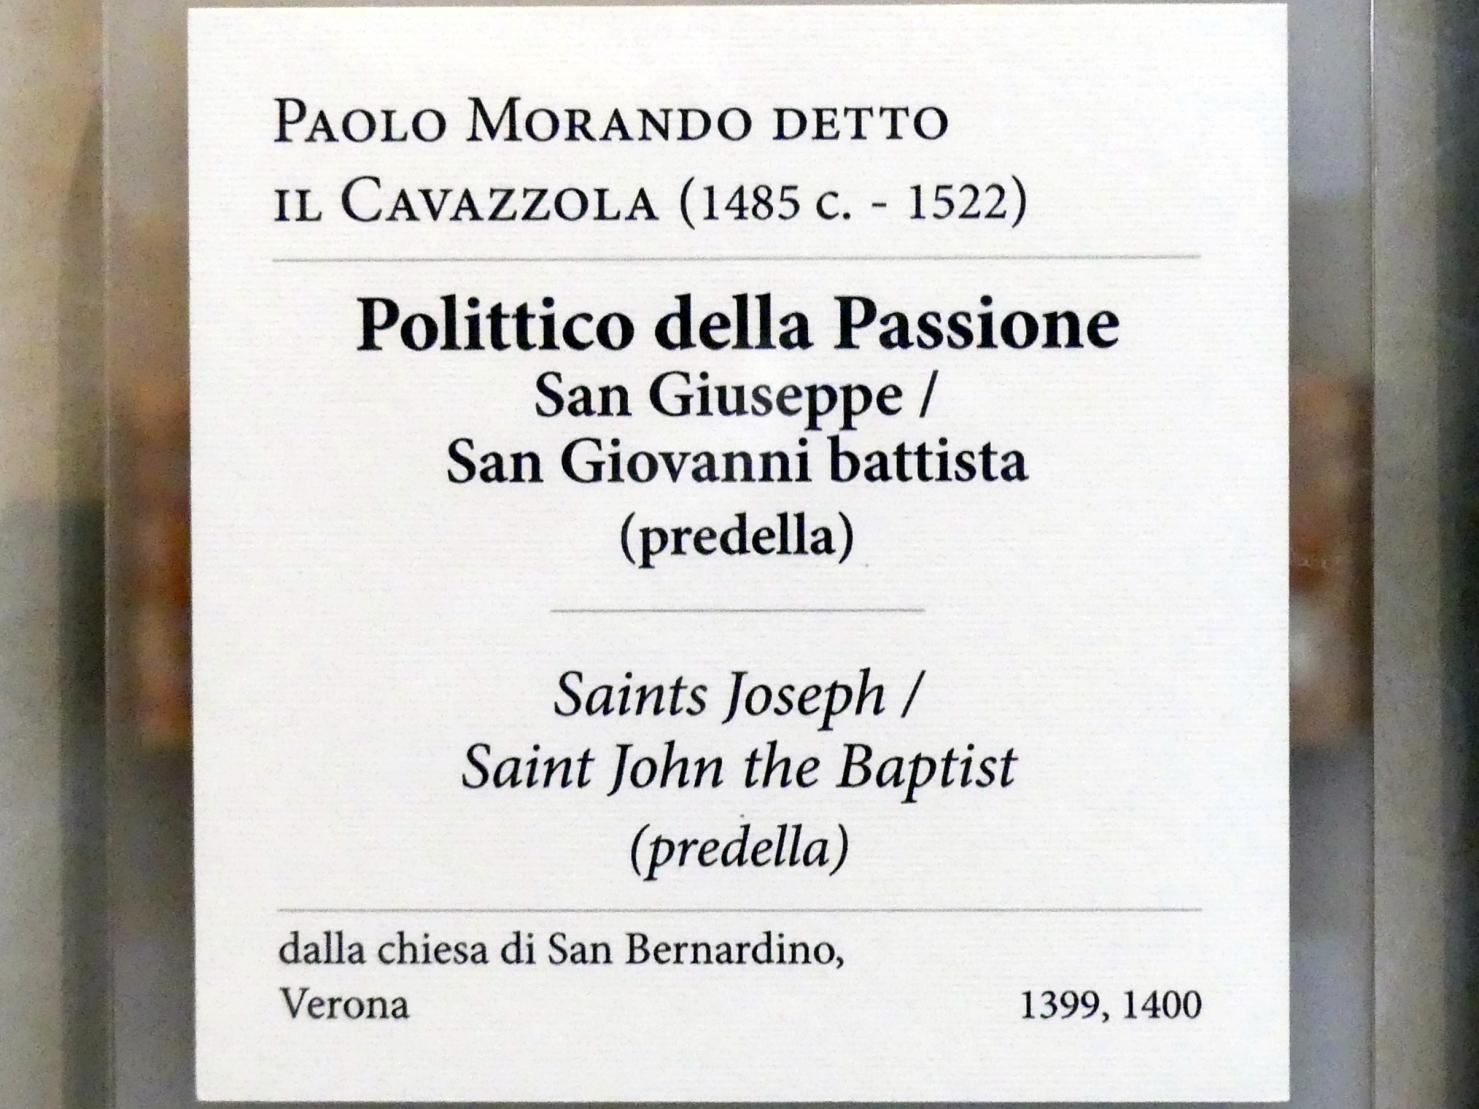 Paolo Morando (Cavazzola): Predella des Polyptichons der Passion, 1517, Bild 6/7